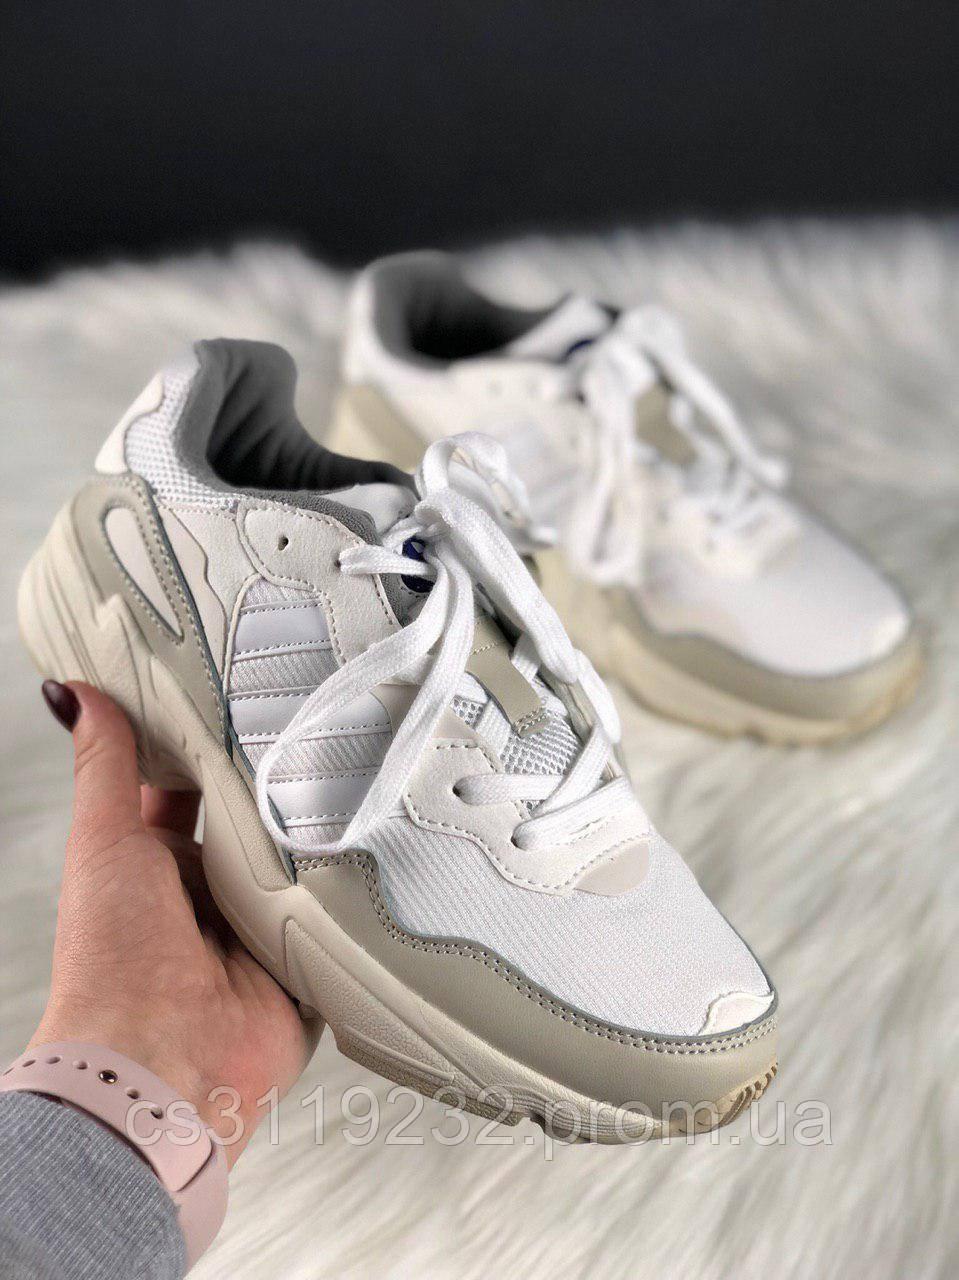 Женские кроссовки Adidas Yung 96 White (белые)